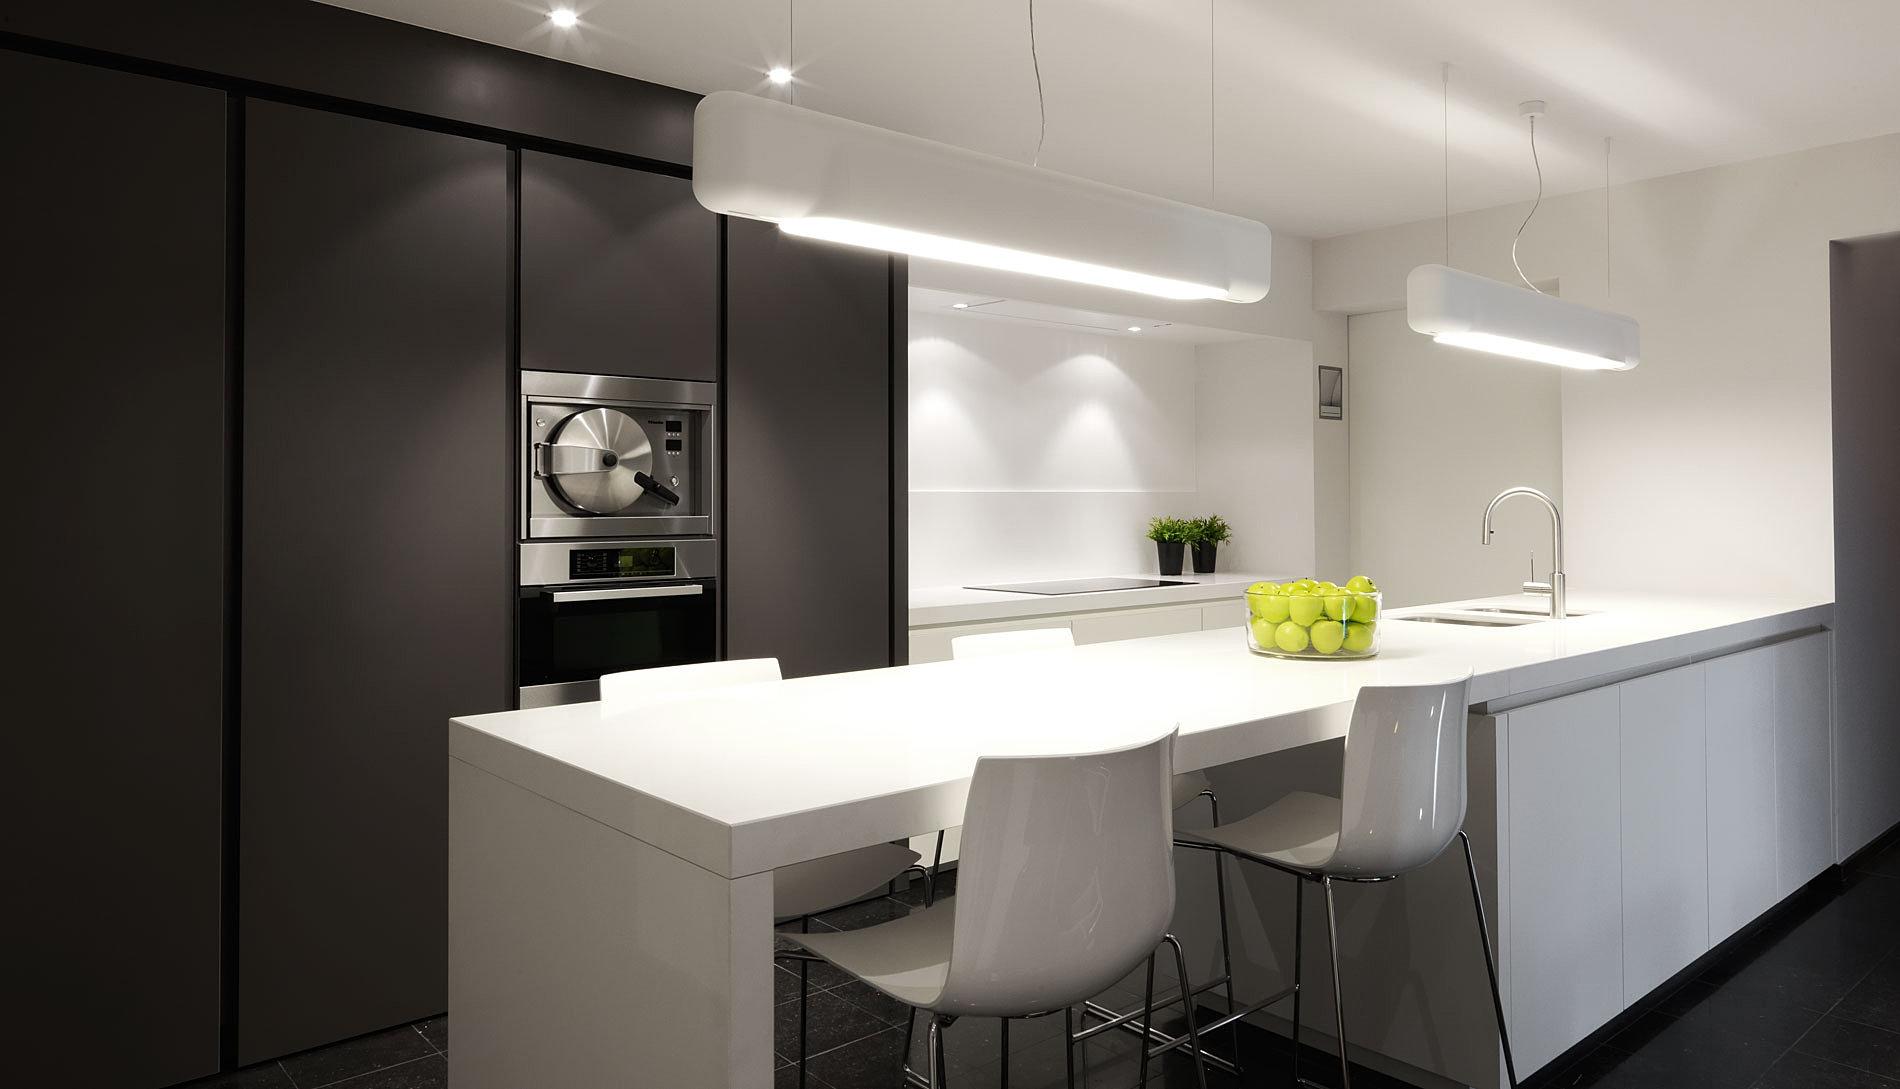 Moderne Keukens Gent : Keukens, badkamers en interieur. MP BUYL - Gent ...